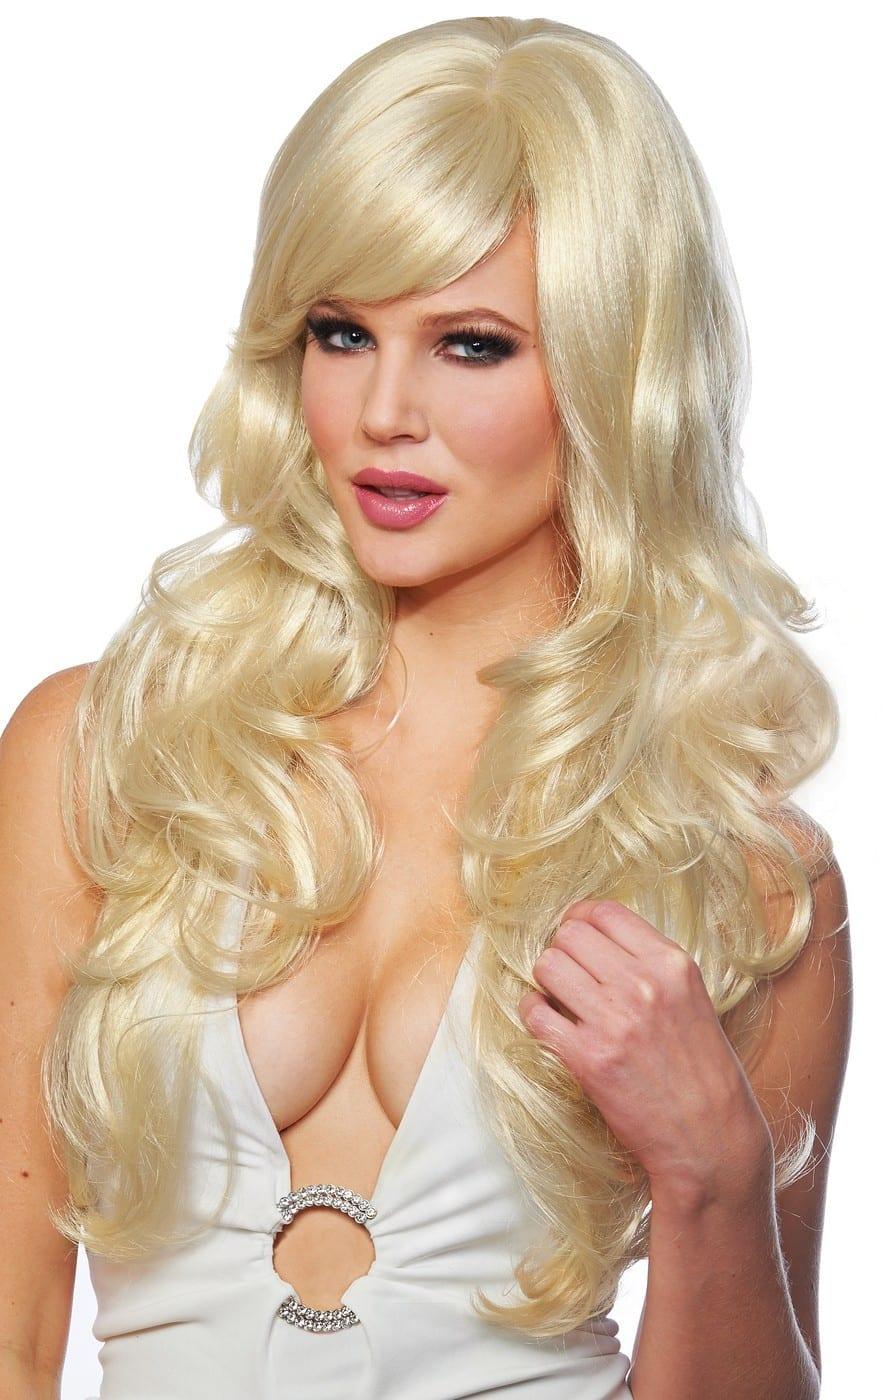 Delovely Wig-0